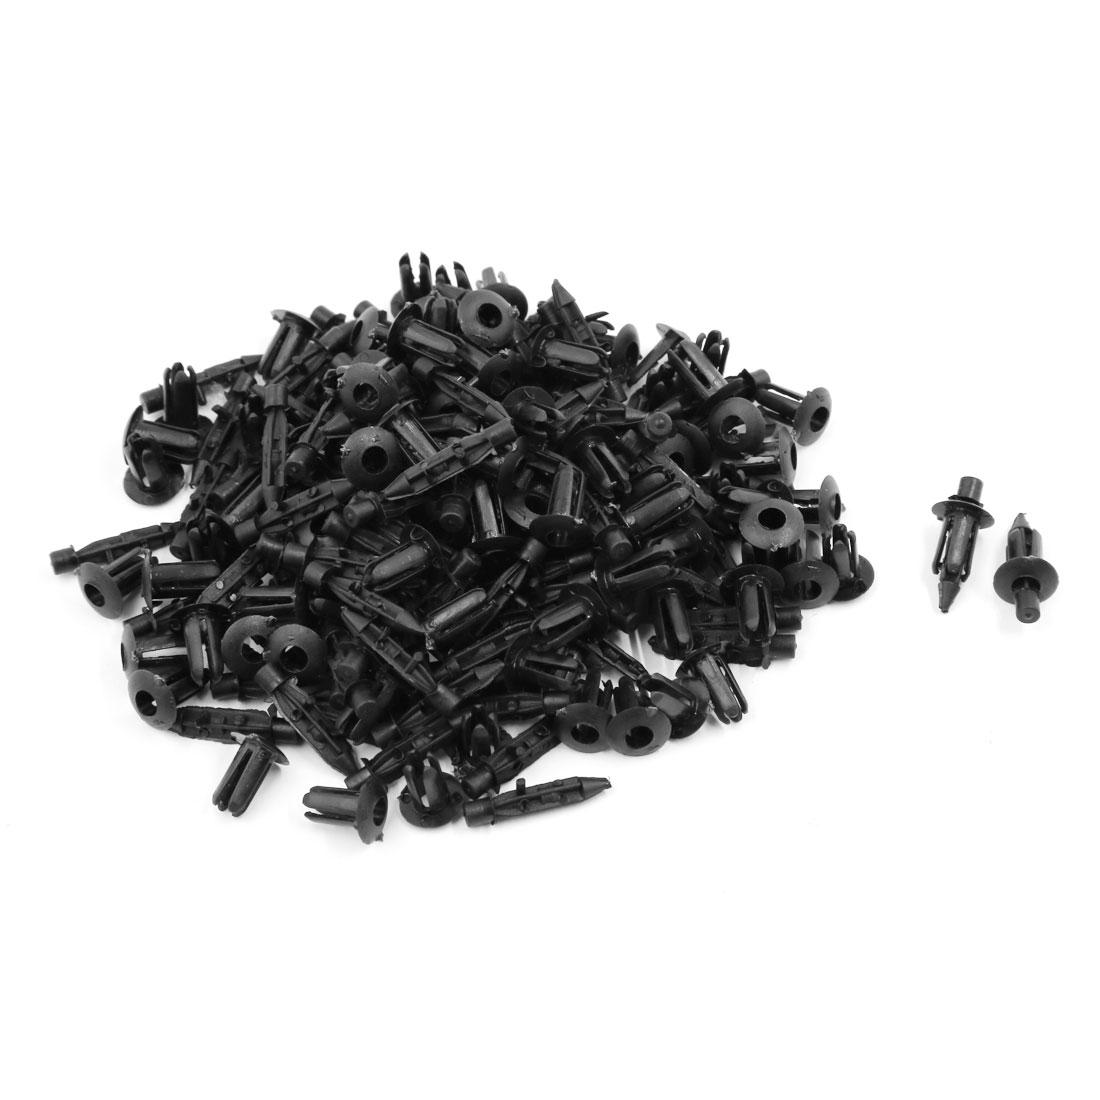 100 Pcs 6mm Black Plastic Push-Type Rivets Fastener Fender Clips